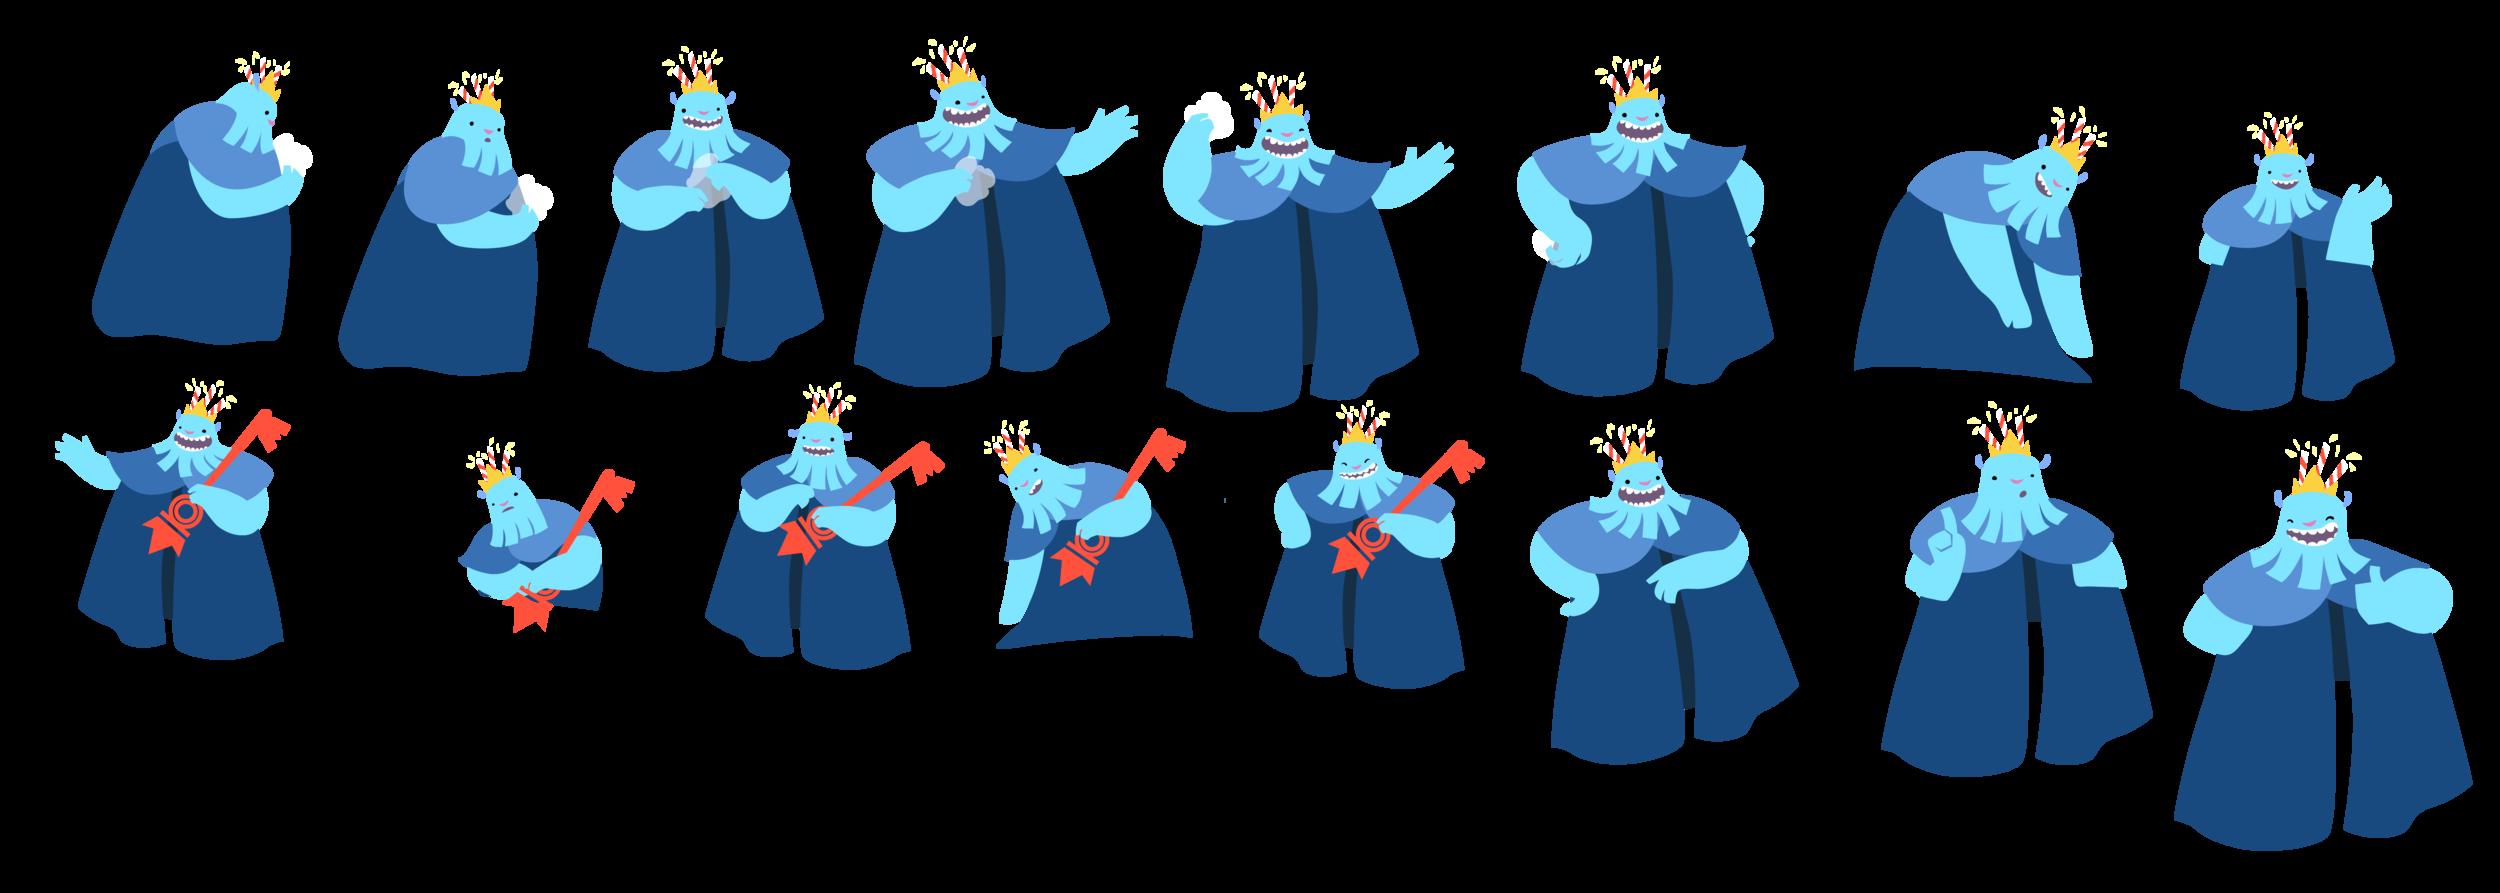 King Mooman Character poses